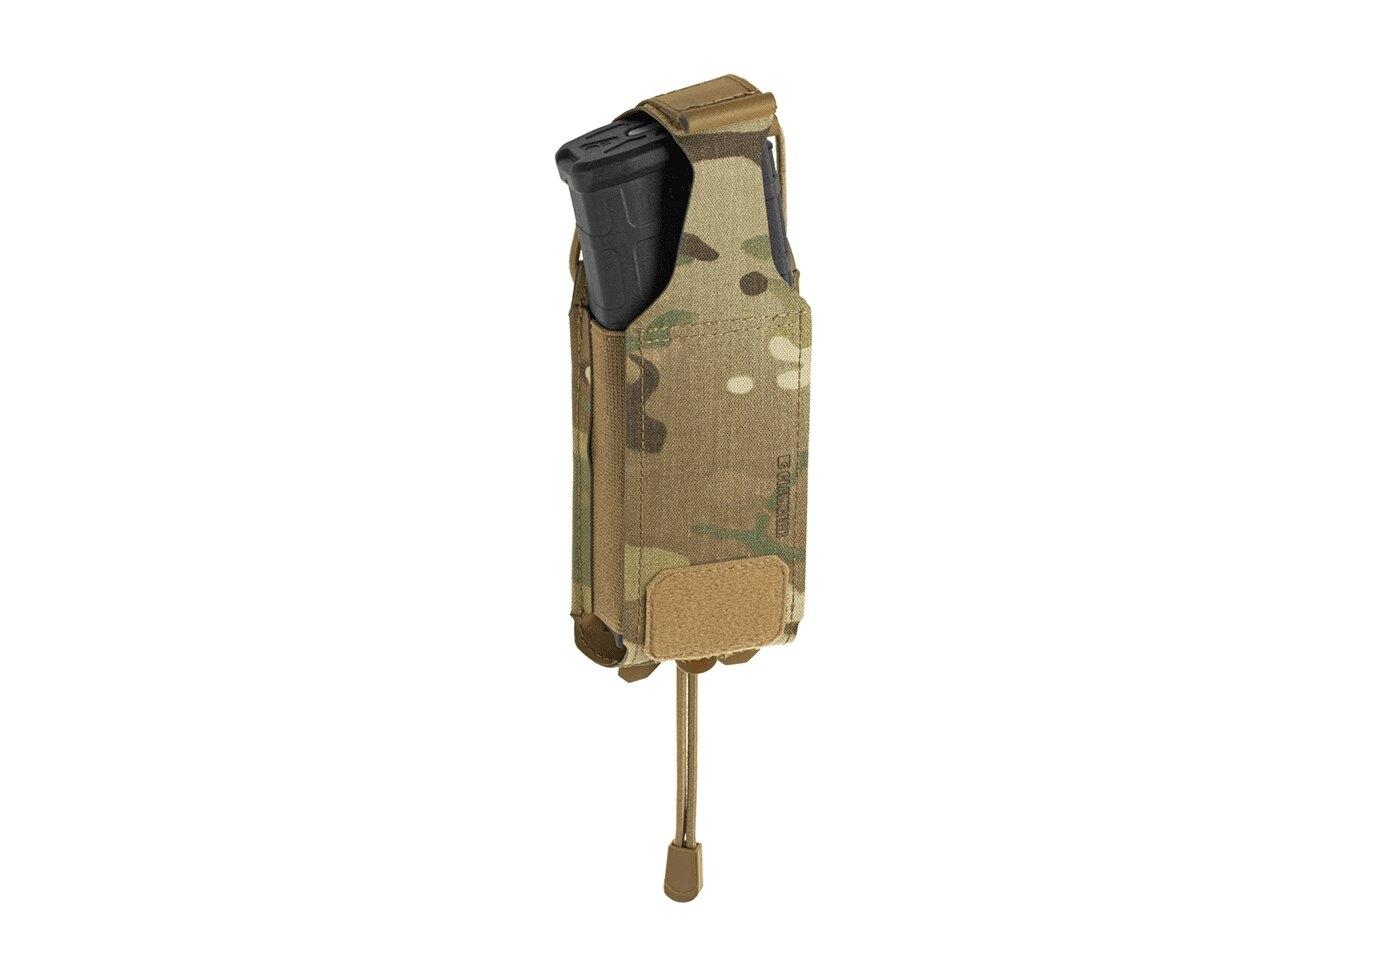 Sumka na zásobník 5,56 mm CLAWGEAR® - Multicam® (Farba: Multicam®)